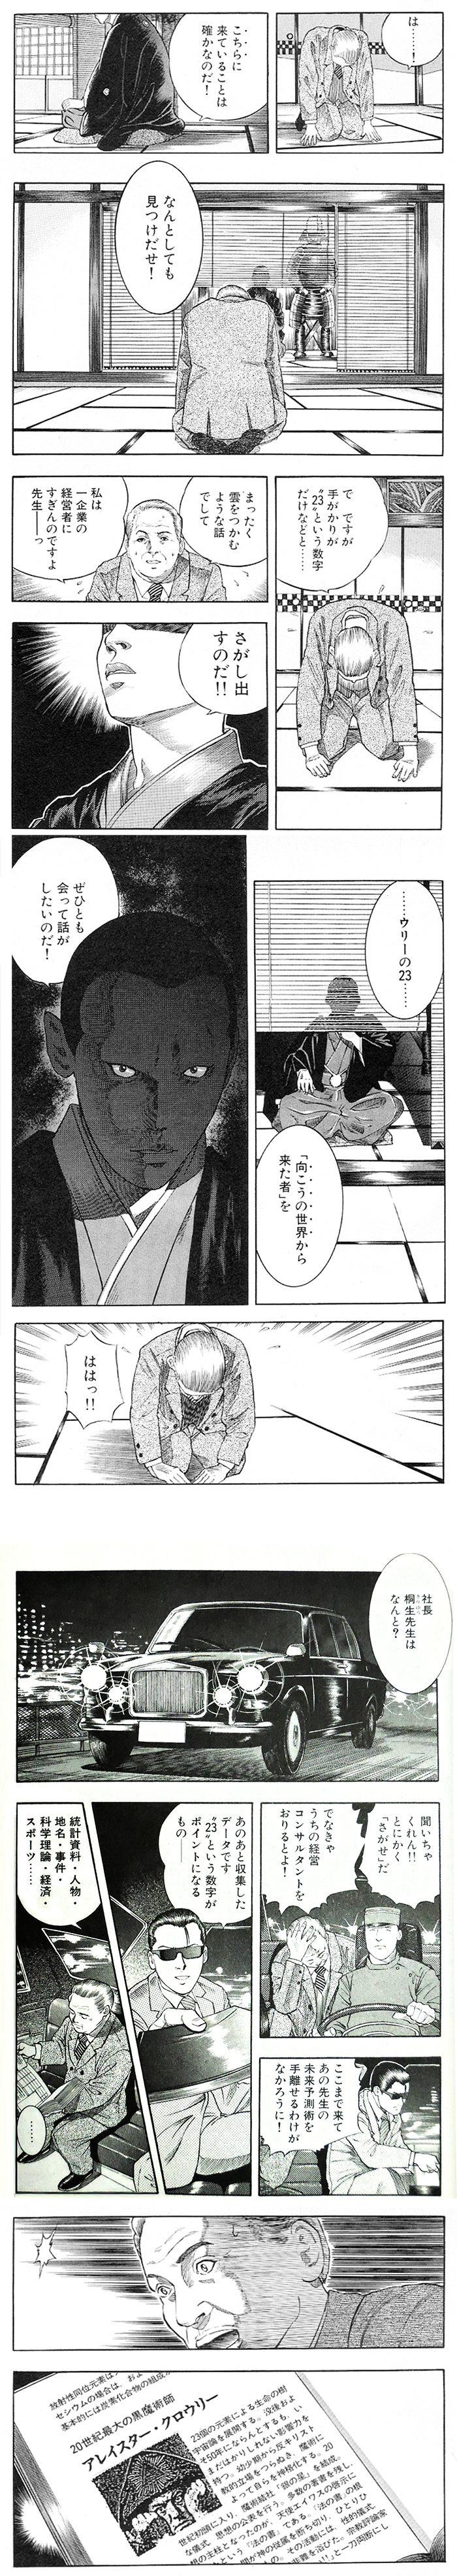 inugami7-02a